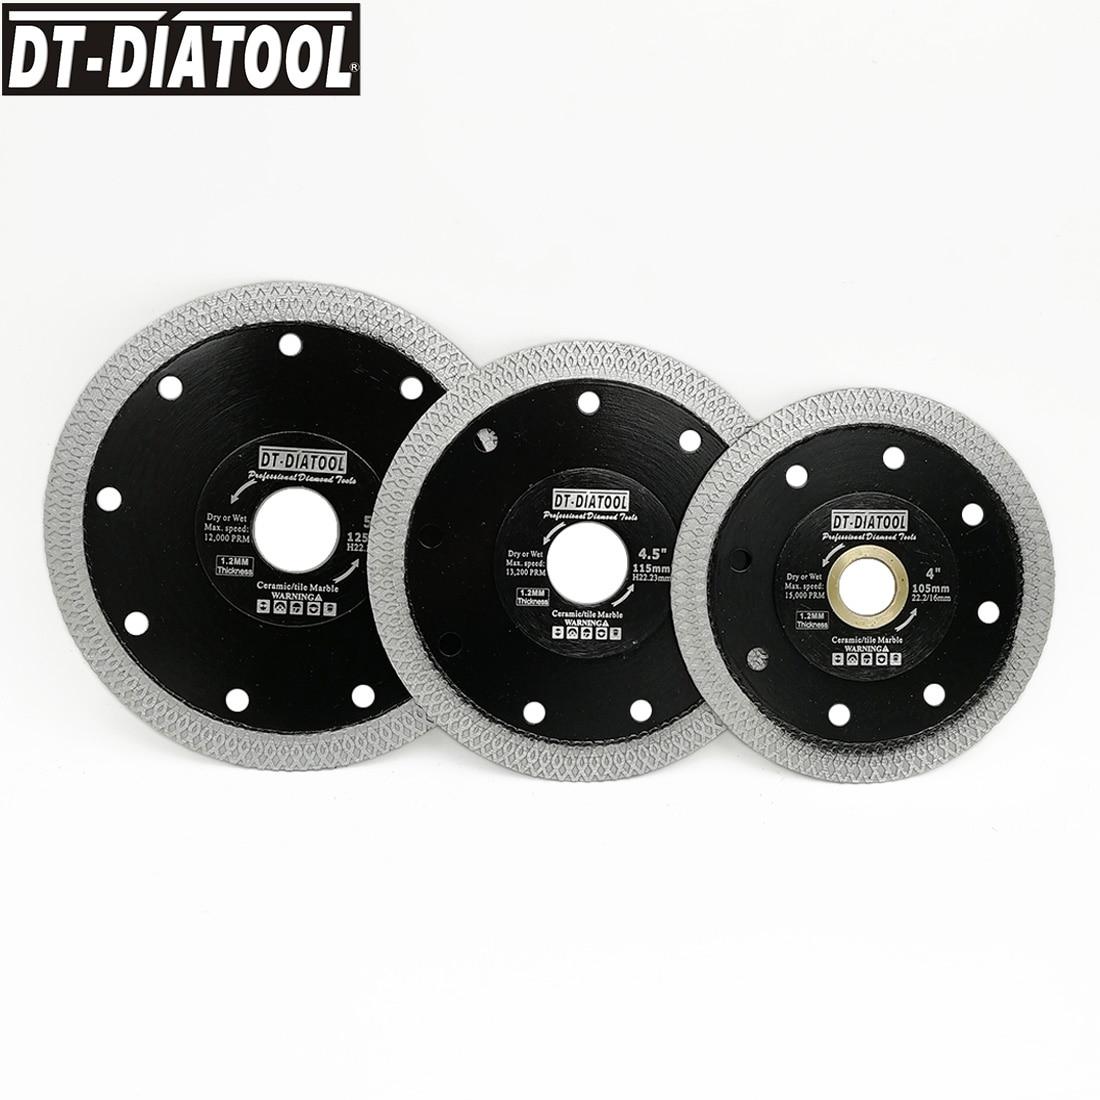 DT-DIATOOL 5pcs/pk Dia 105/115/125MM High Quality Dry Or Wet Diamond X Mesh Turbo Rim Segment Saw Blades Cutting Disc 4